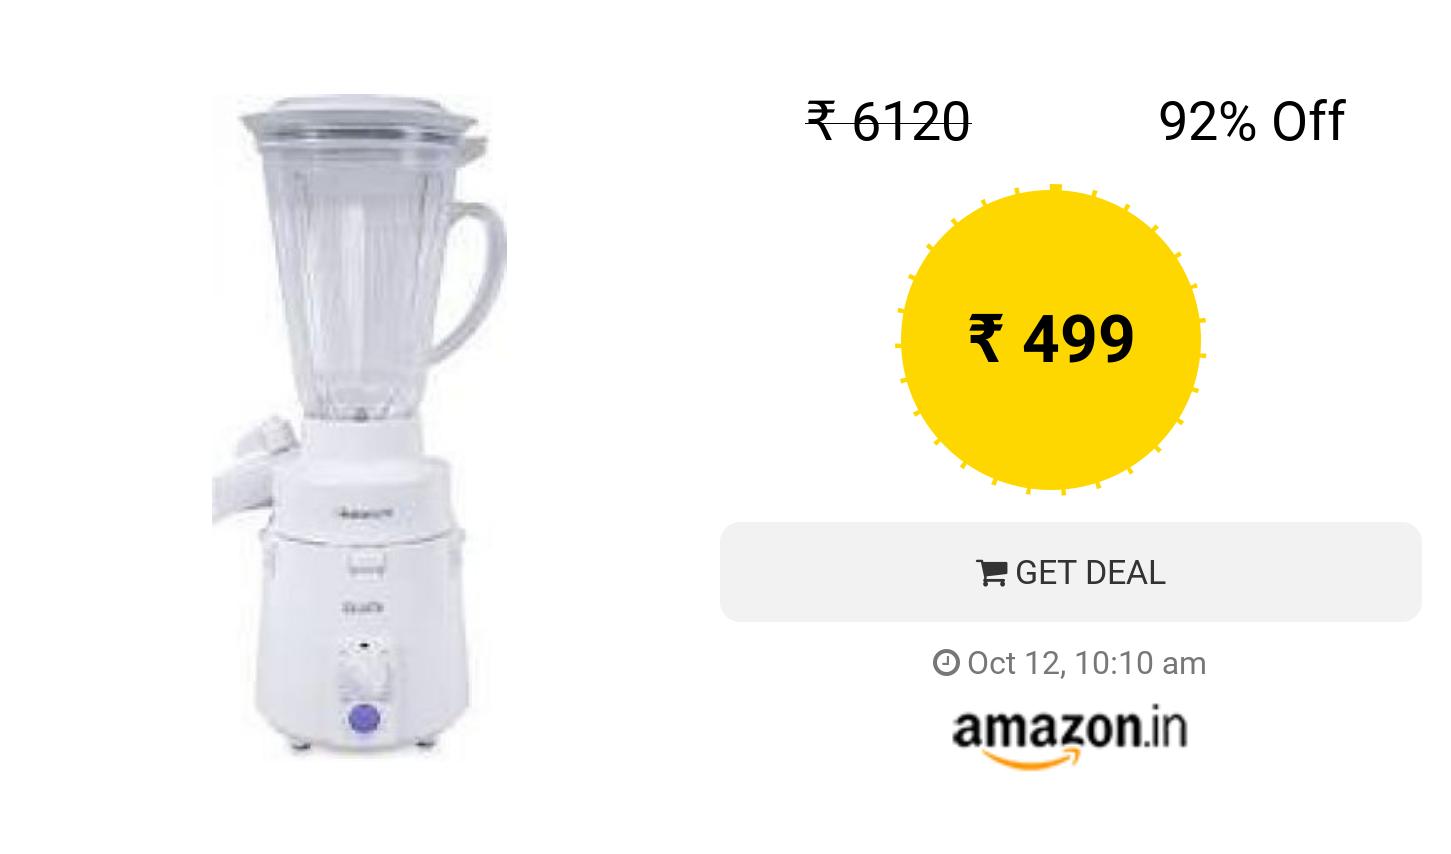 Sujata Supermix 804 Roi 810 Watt Mixer Grinder White Mixer Watt Online Shopping Stores